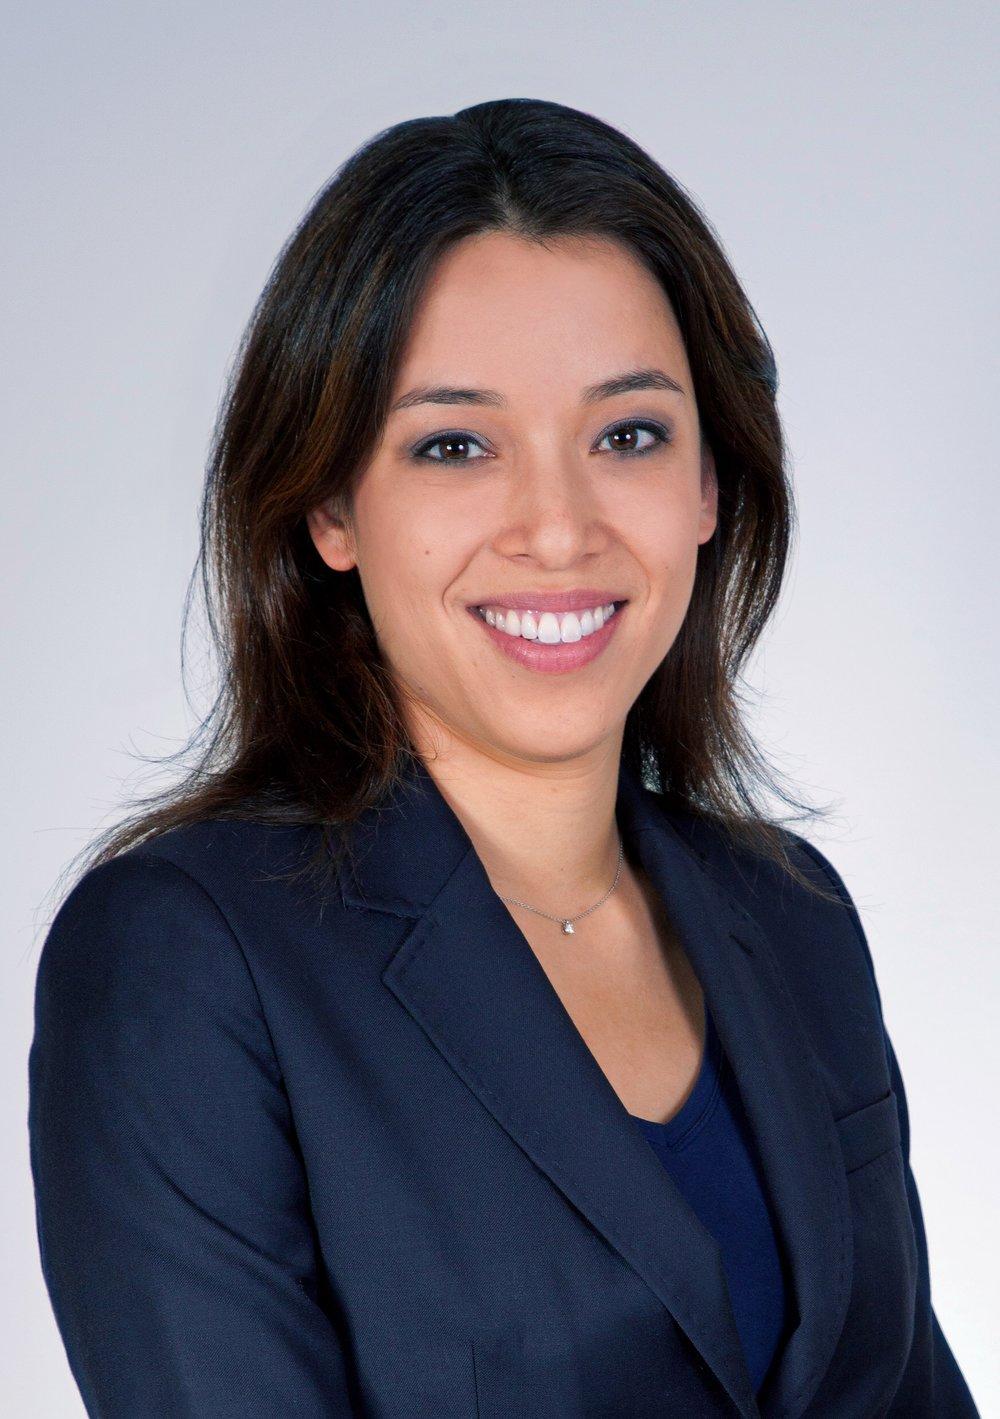 Tanja Meier Sieden, Head of Corporate and Portfolio Strategy